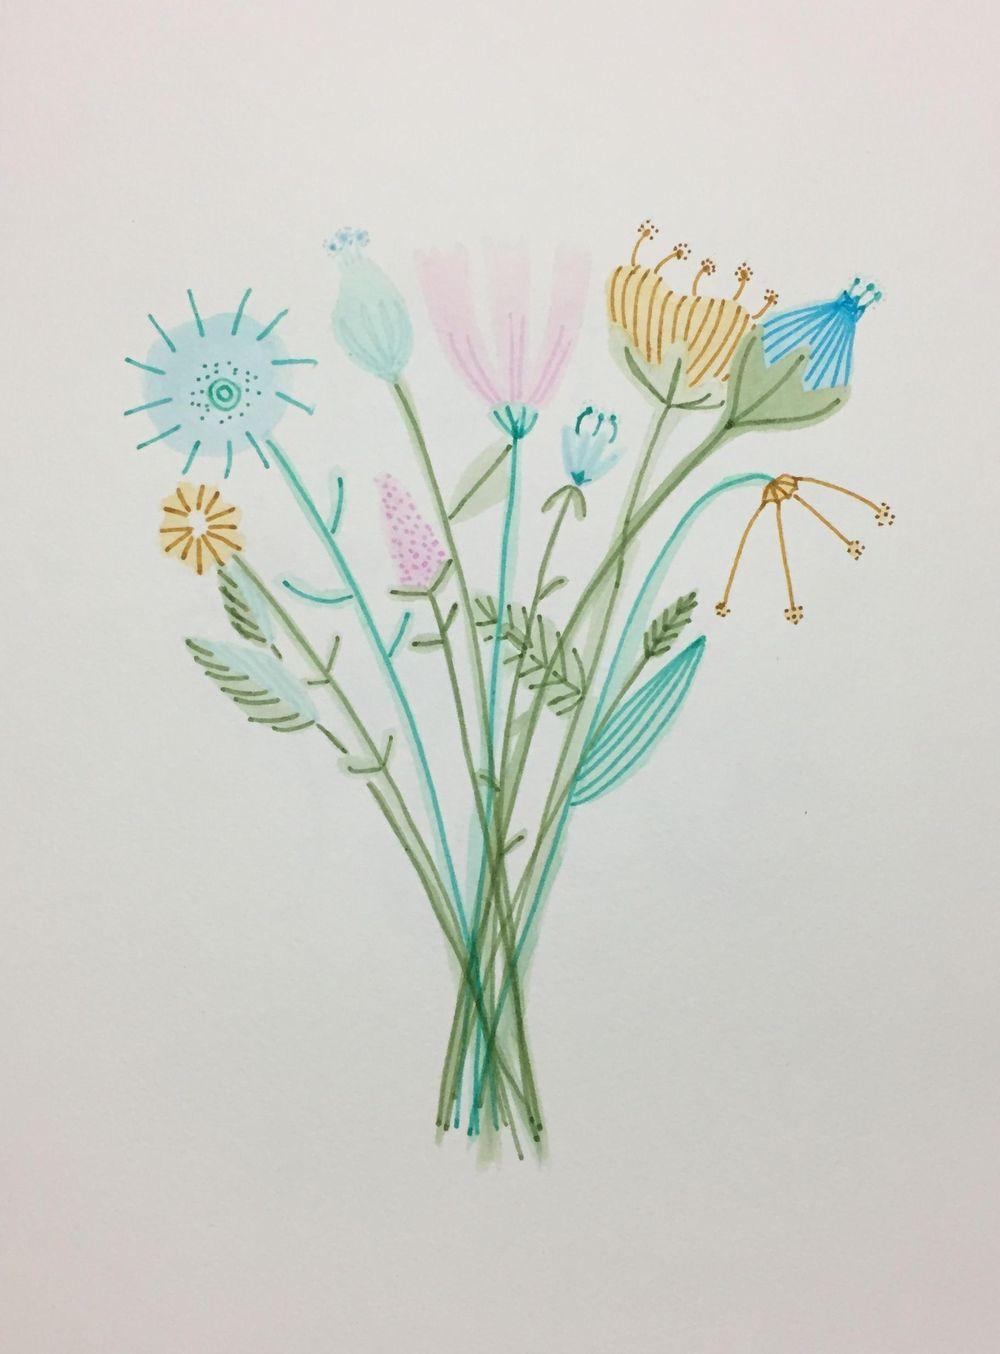 Expressive Brush Pen Florals - image 1 - student project